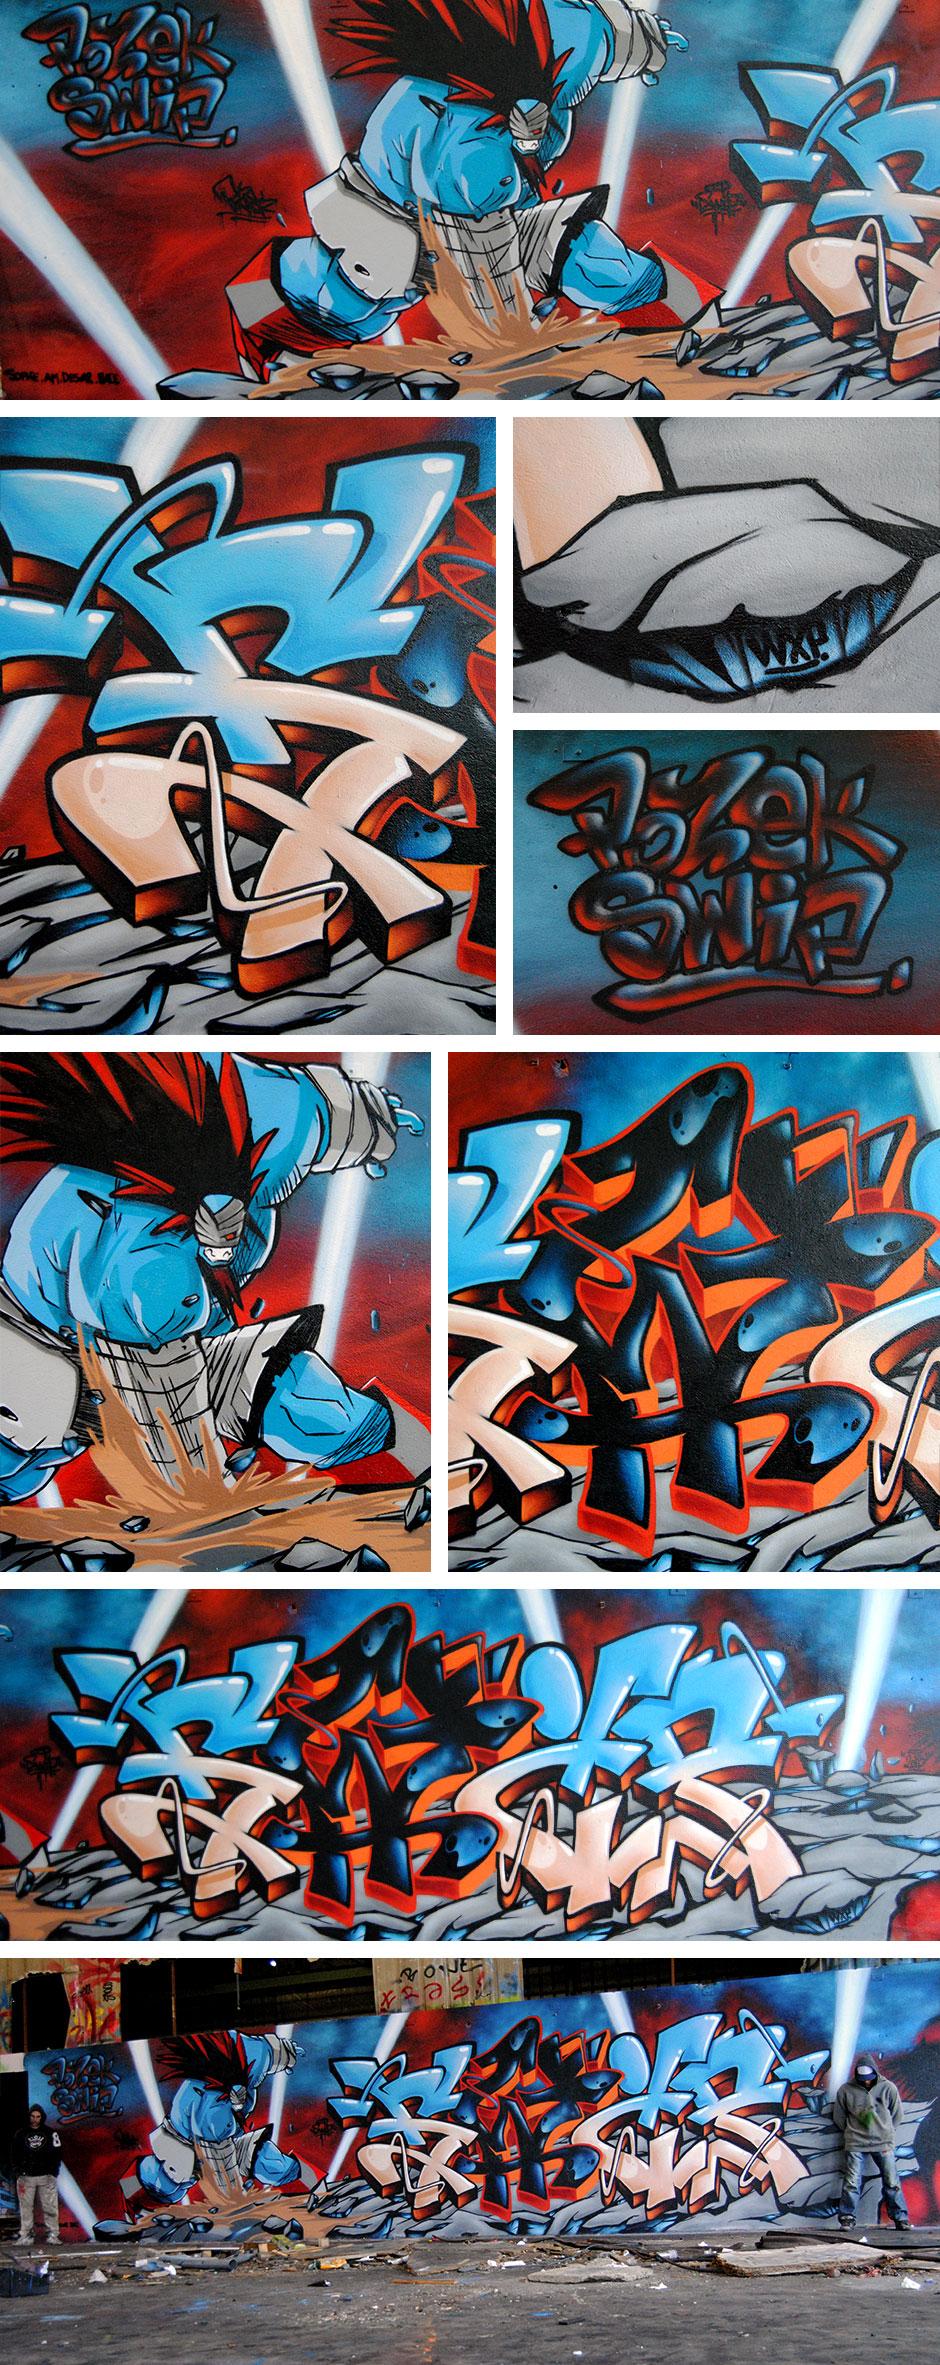 Ankama-graffiti-montage-1-deco-graffiti-toulouse-swip-swiponer-wxp